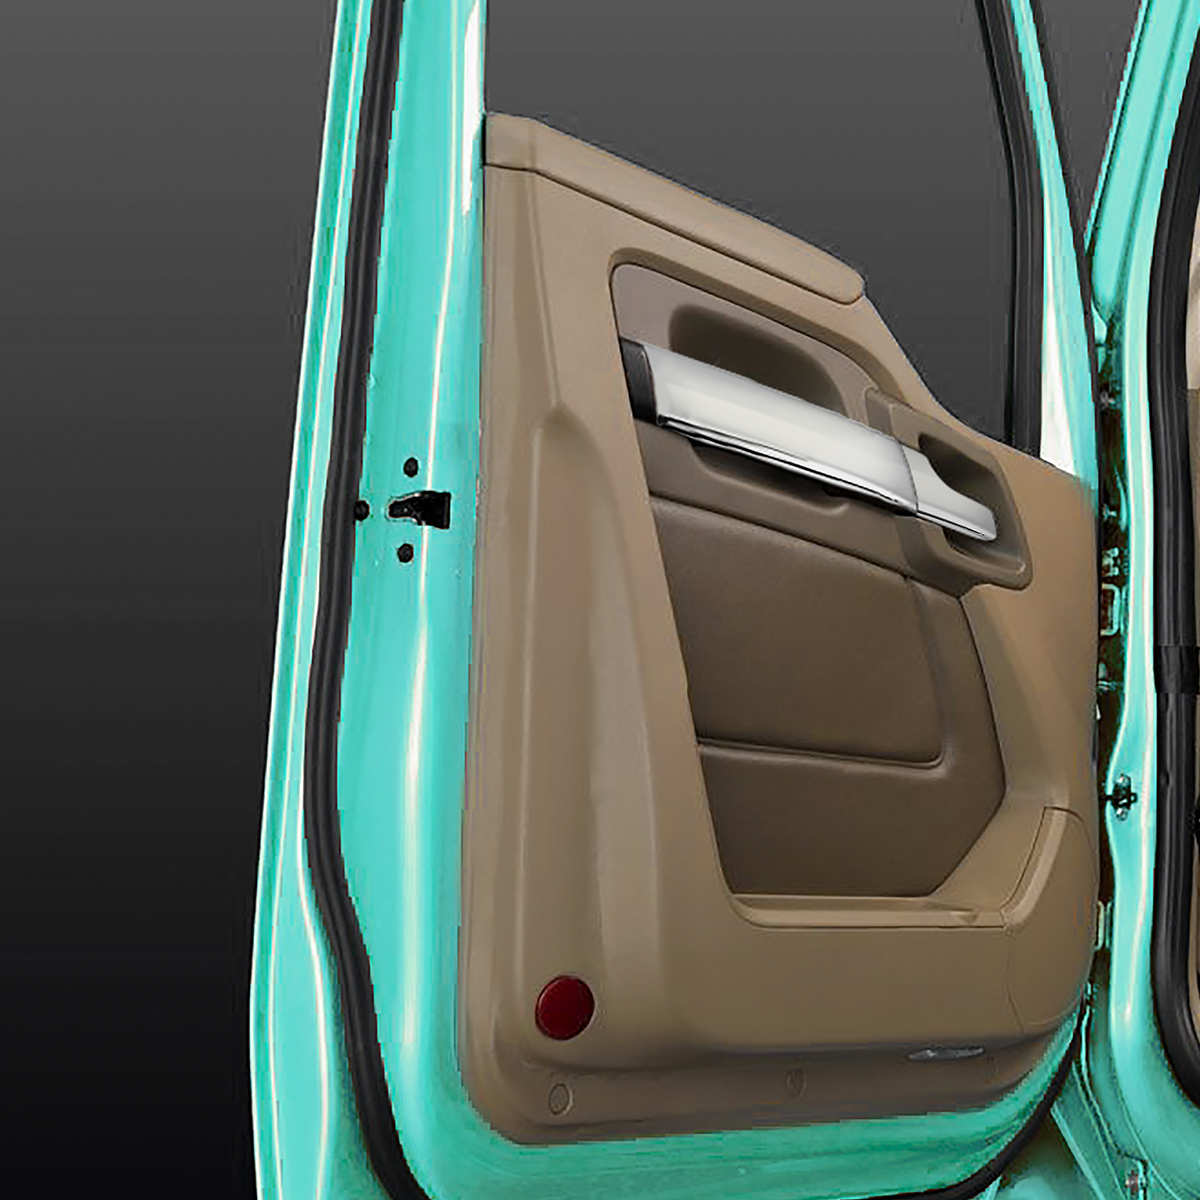 P//S GG Grand General 67941 Chrome Plastic Inside Door Panel Trim for KW T680 15+